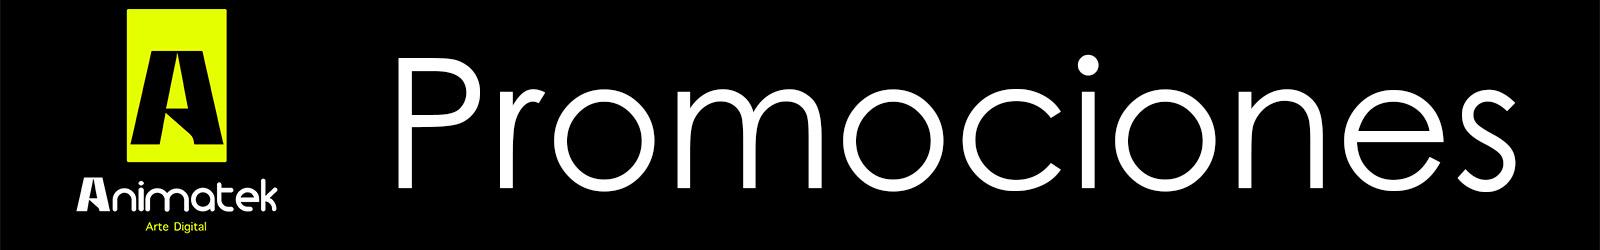 banner-promos-1600x250